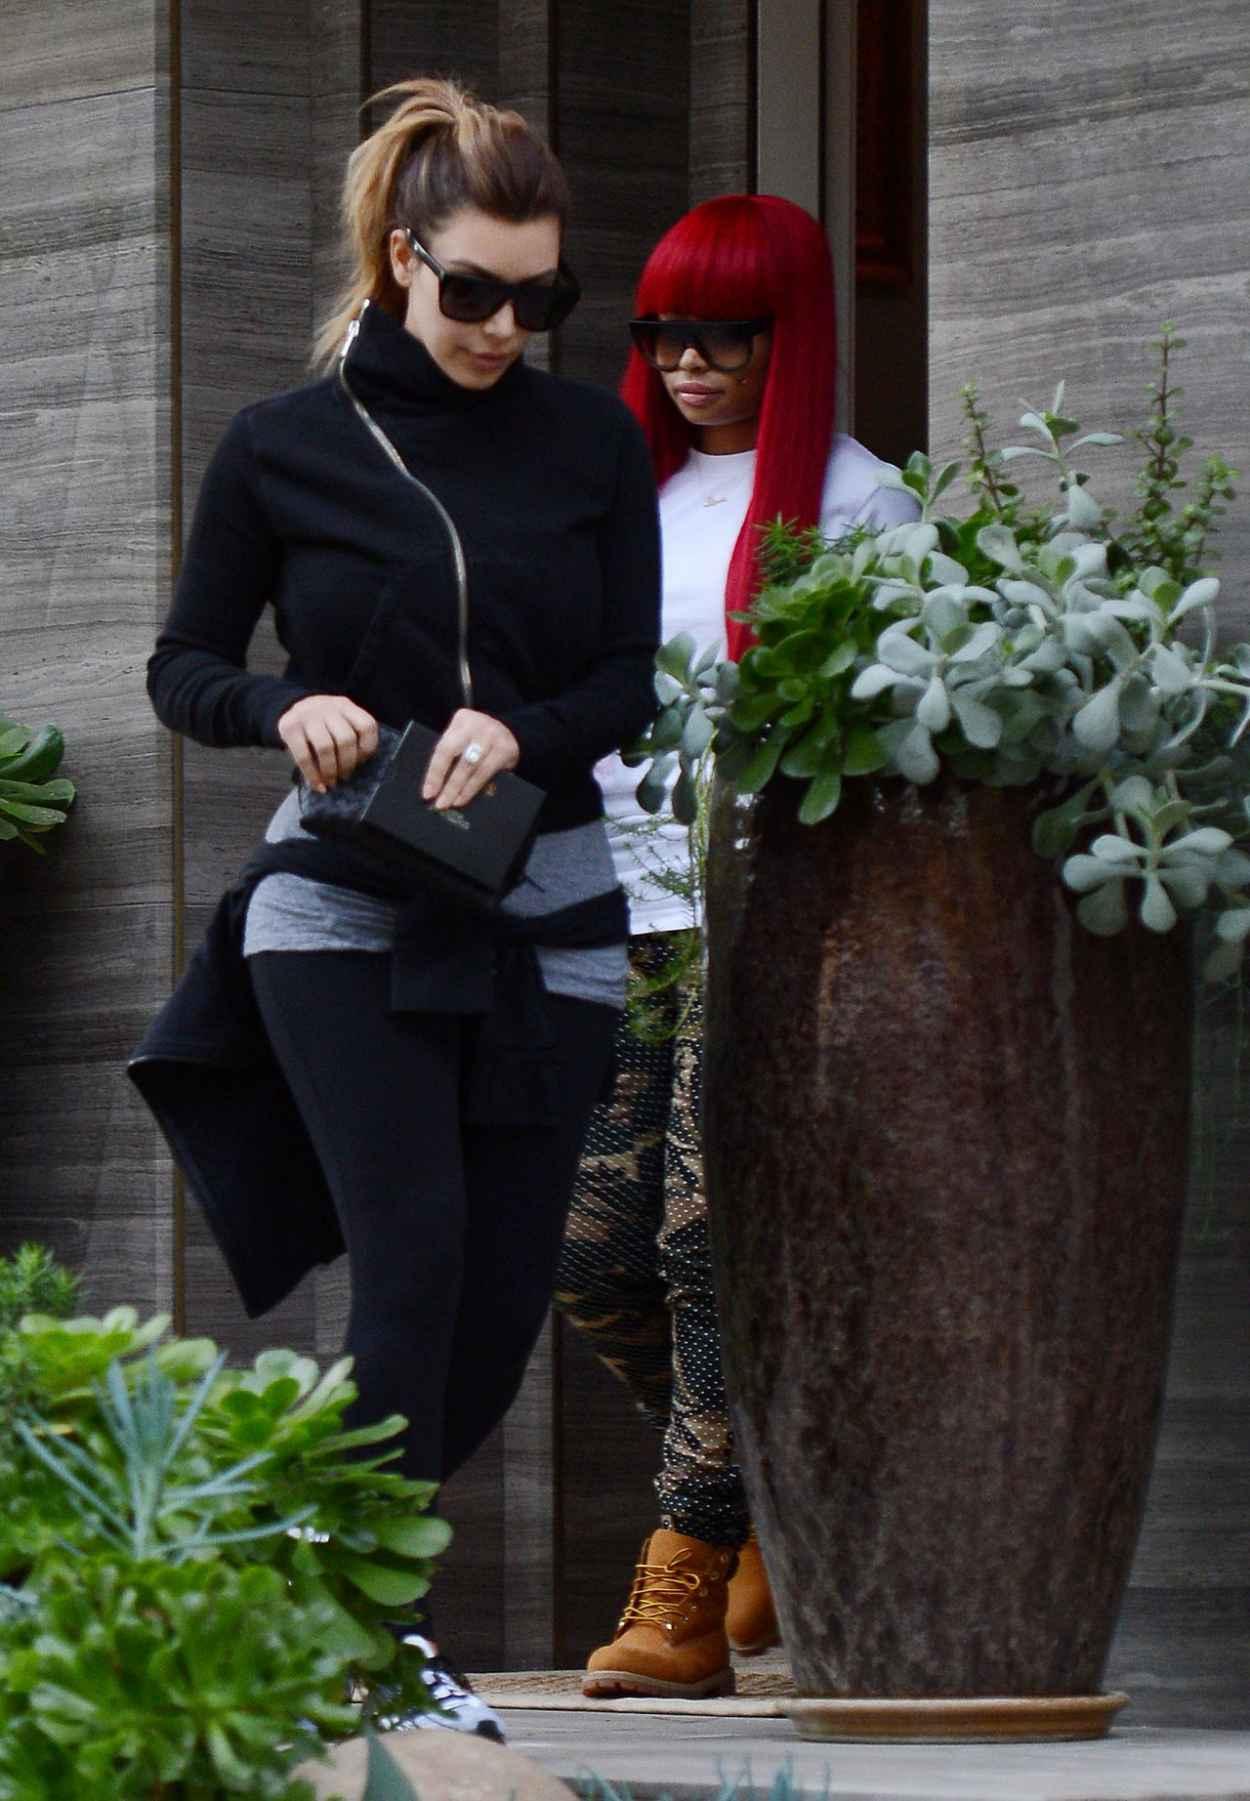 Kim Kardashian Street Style - Visits a Friend in Beverly Hills - December 2015-4